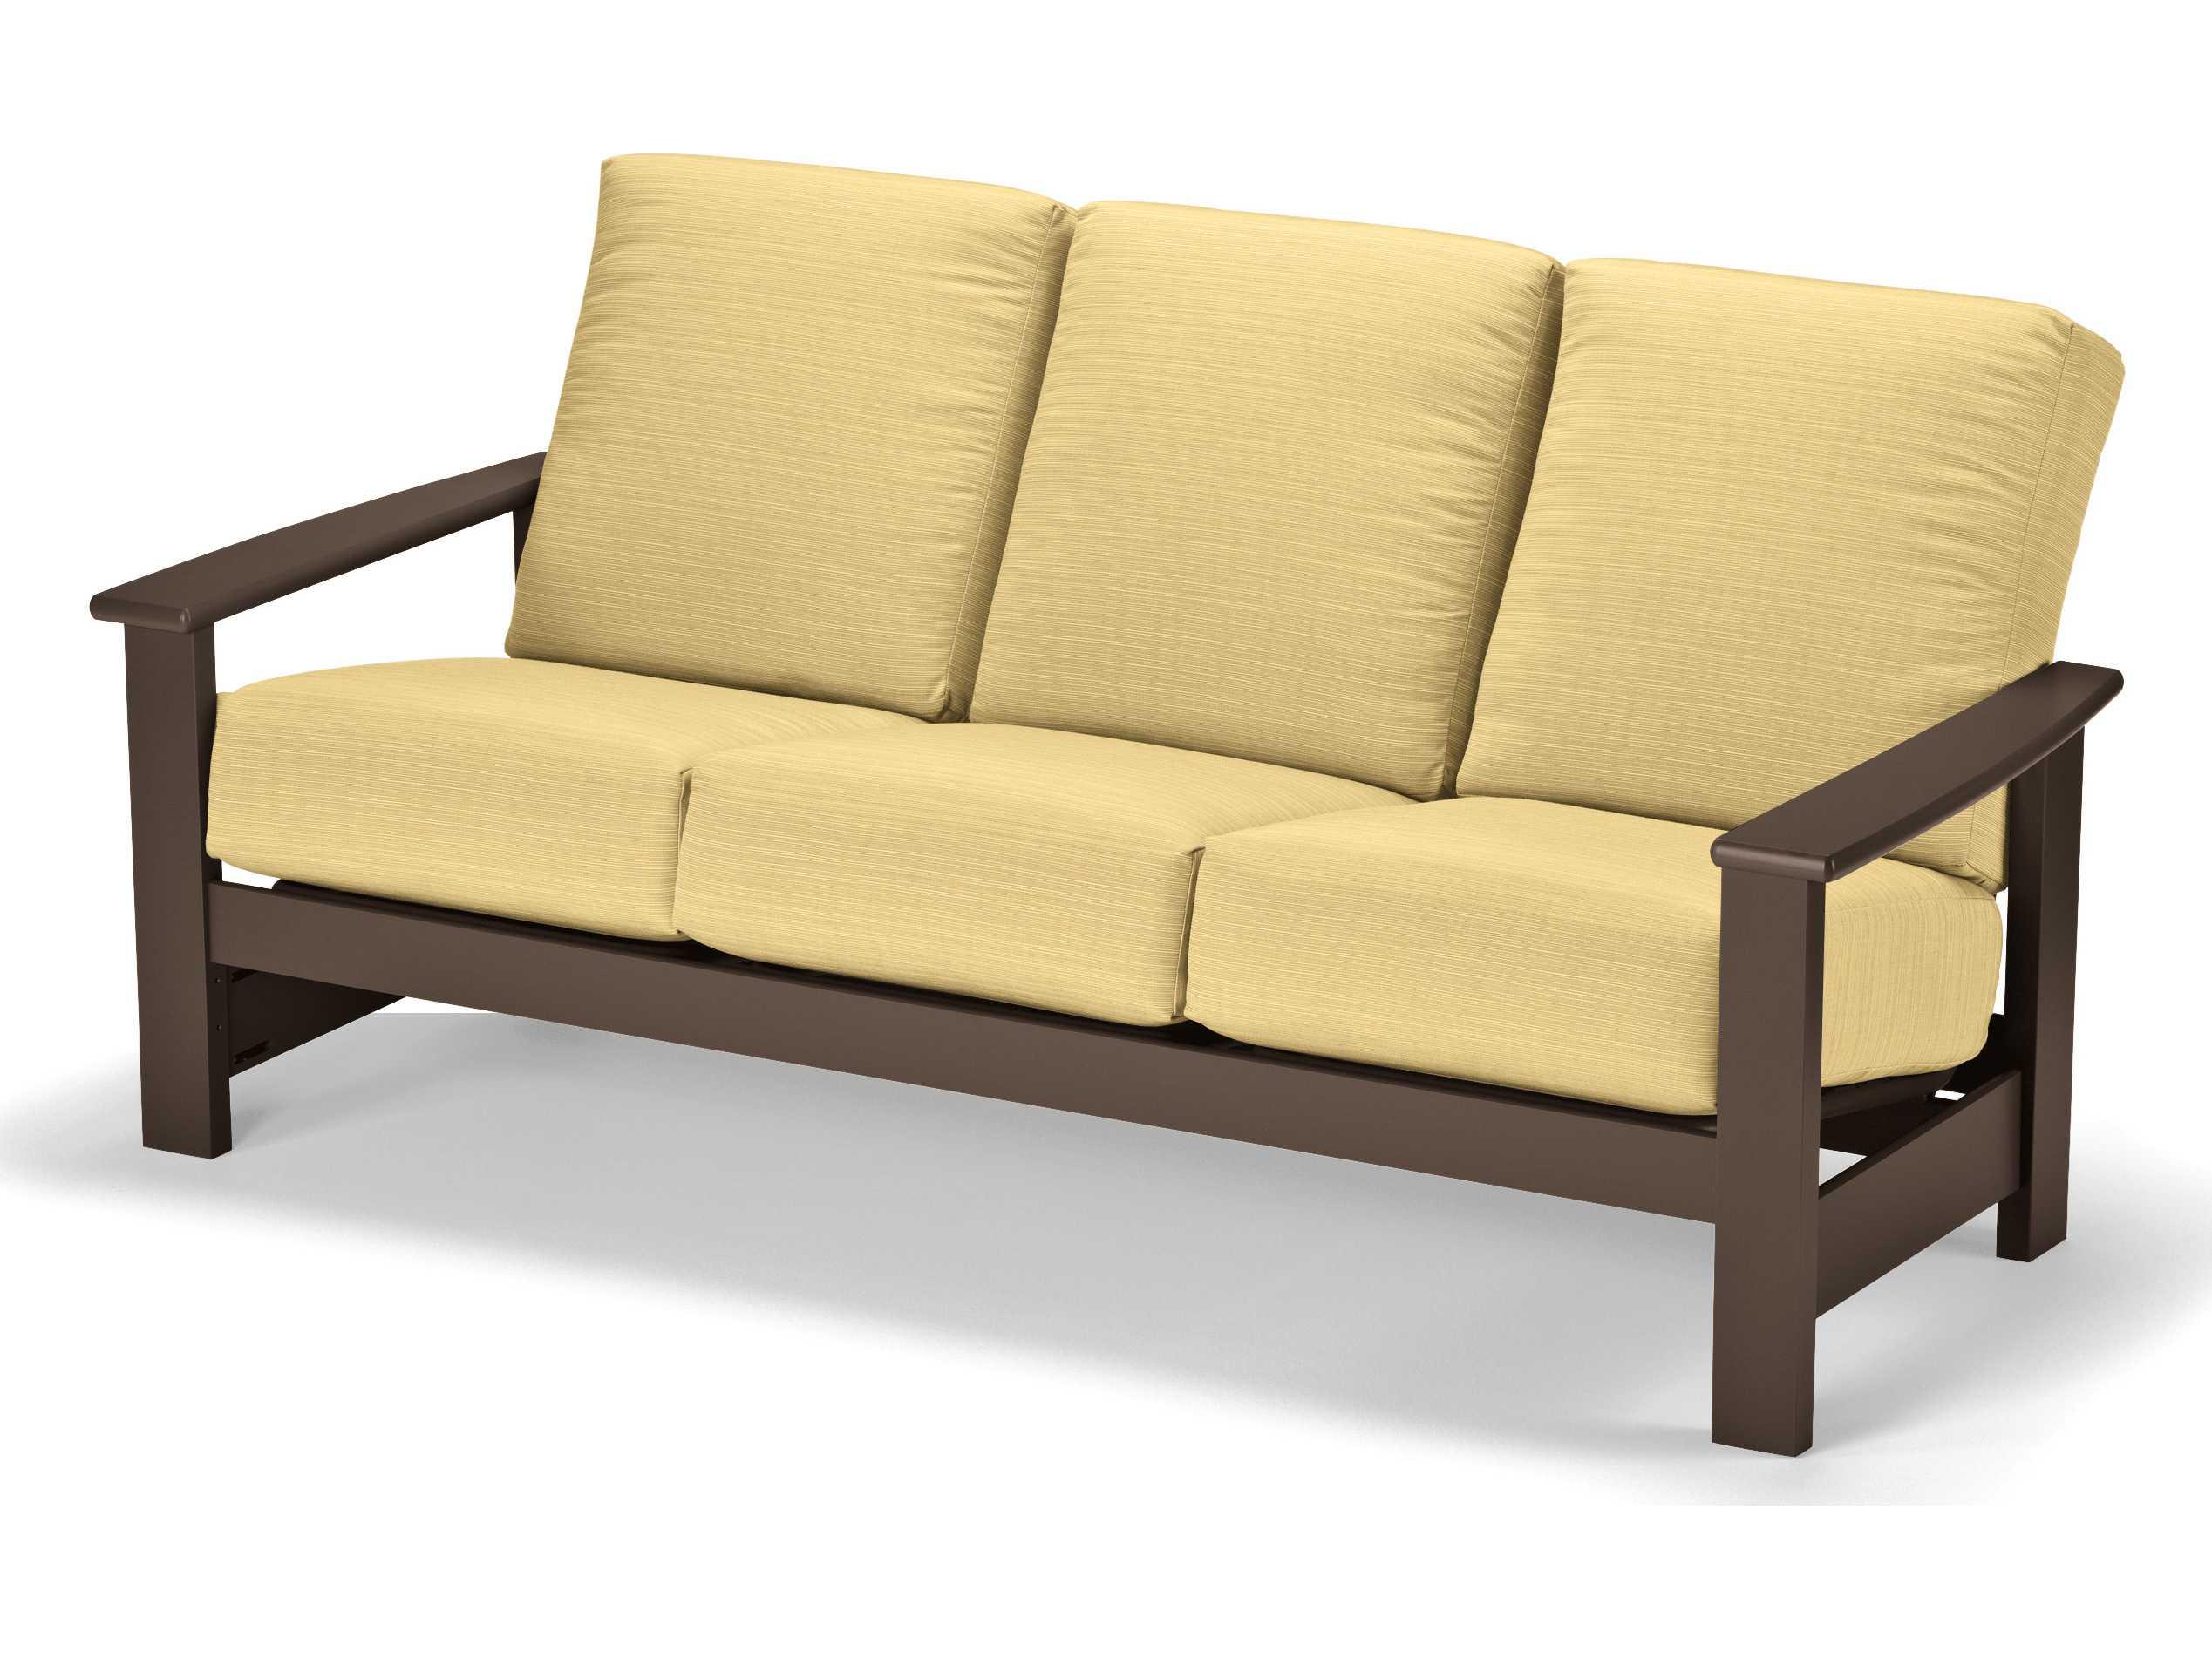 replacement cushions for sofa backs adirondack leather cushion arm chair loveseat swivel hidden